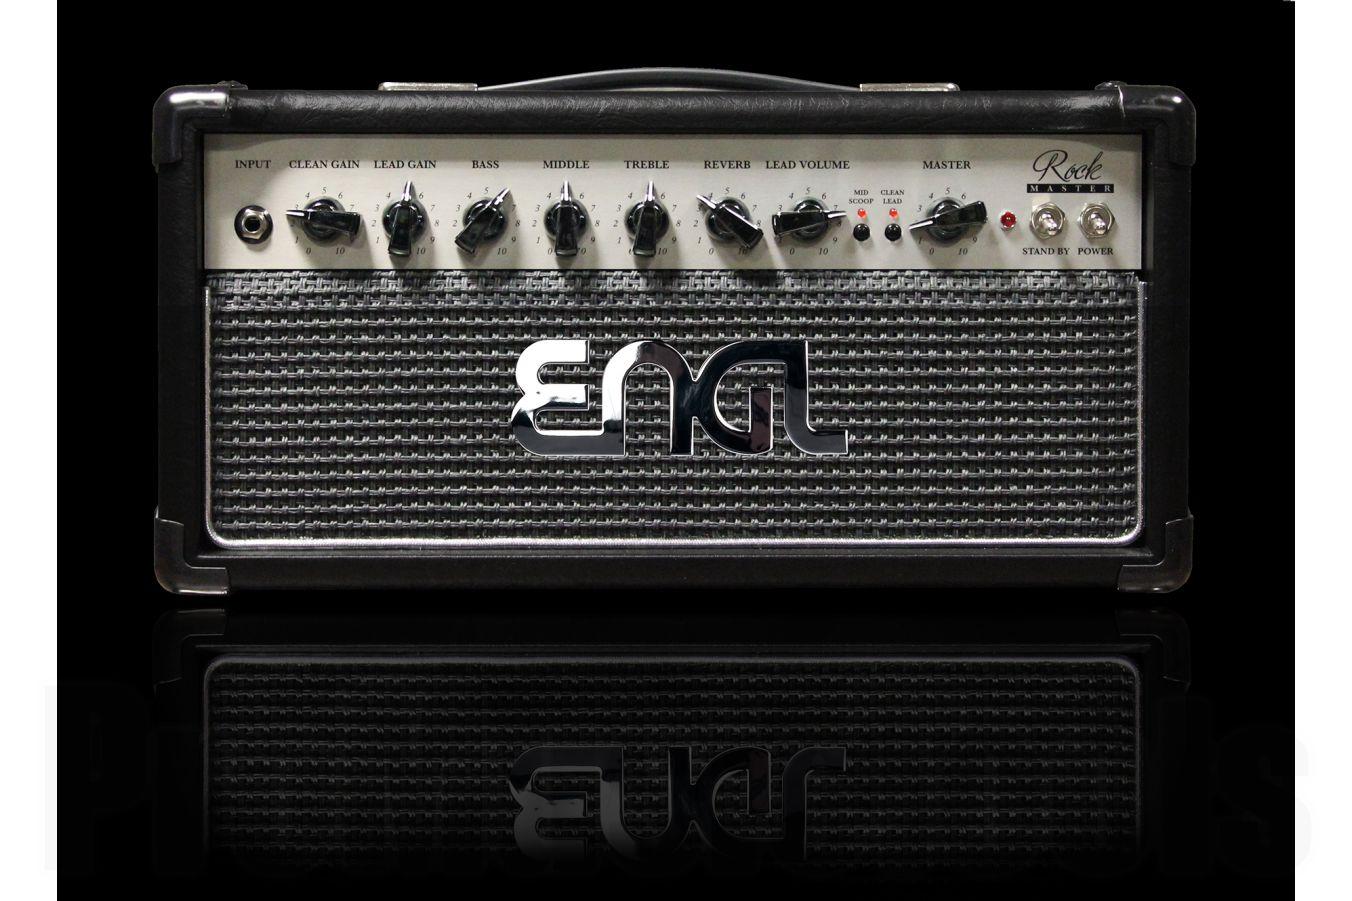 Engl Rockmaster 20 Head E307 - b-stock (1x opened box)